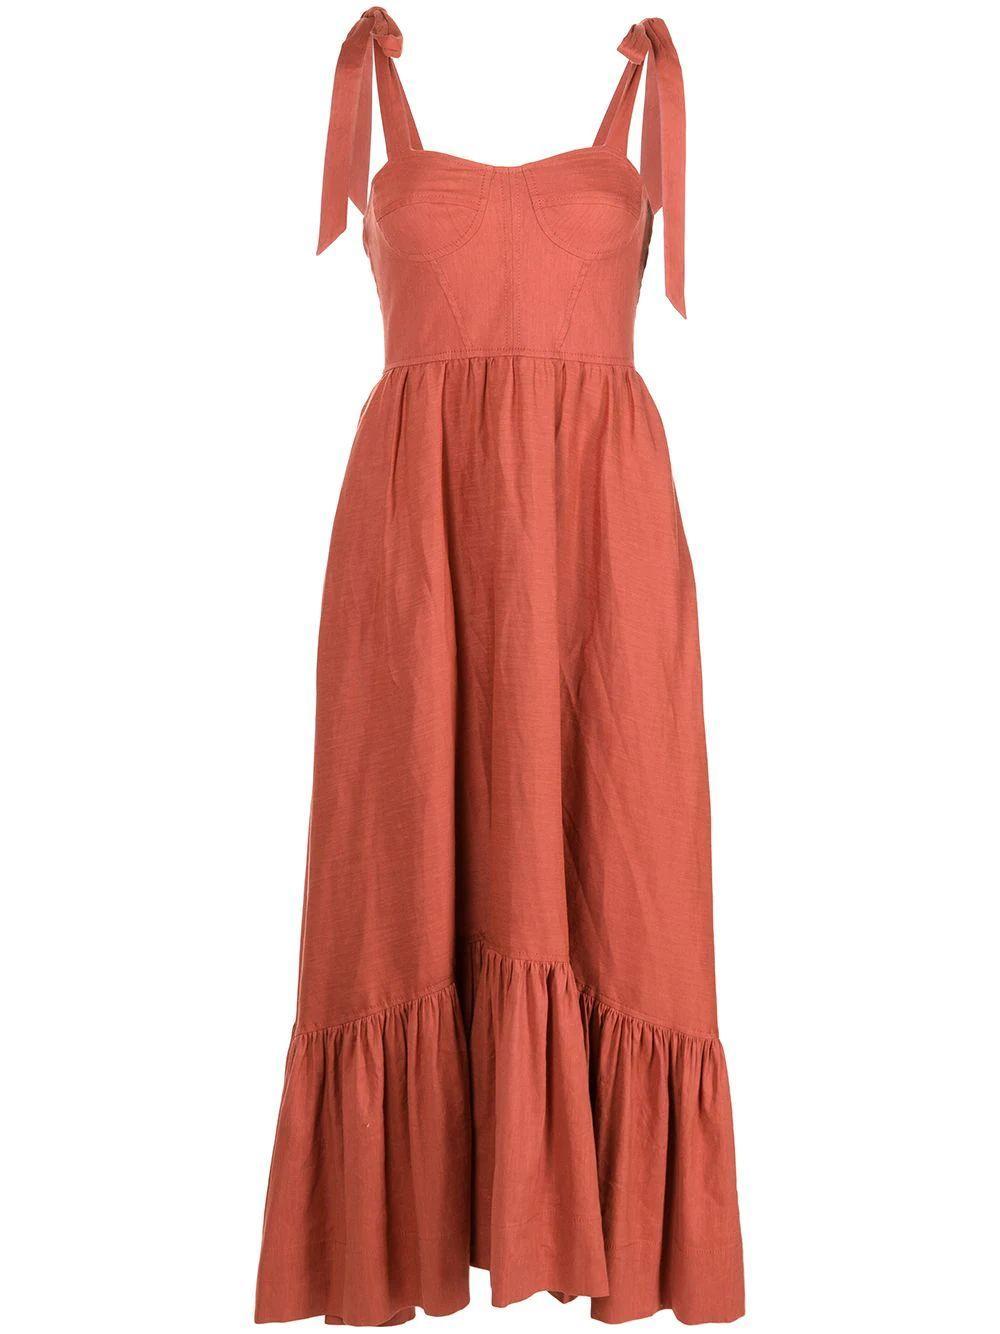 Georgia Bustier Dress Item # 321-1055-I